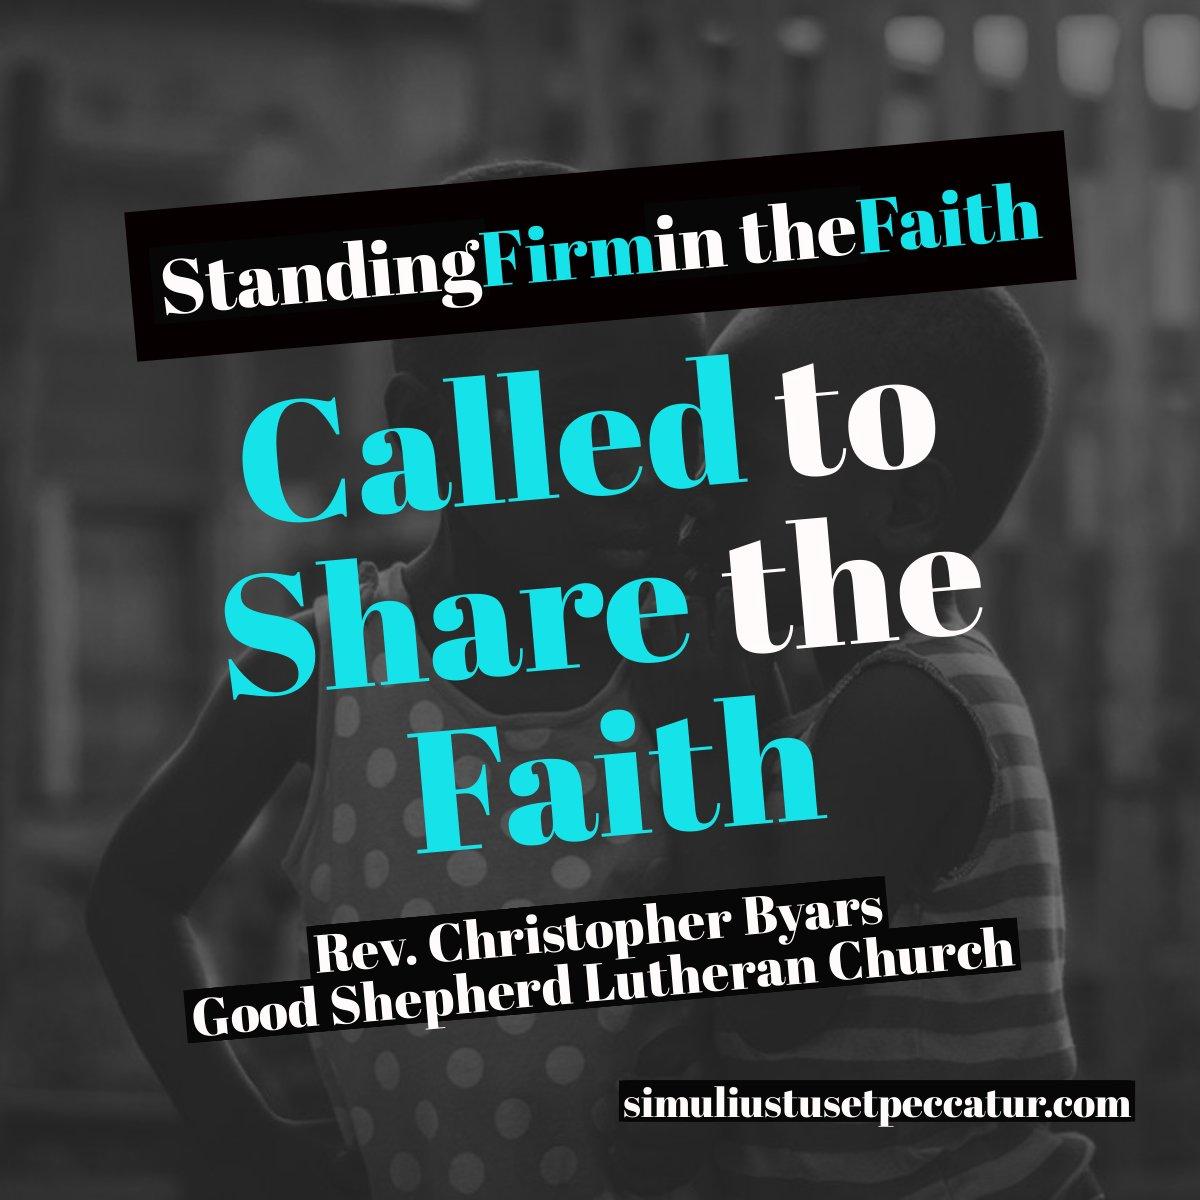 Called to Share the Faith